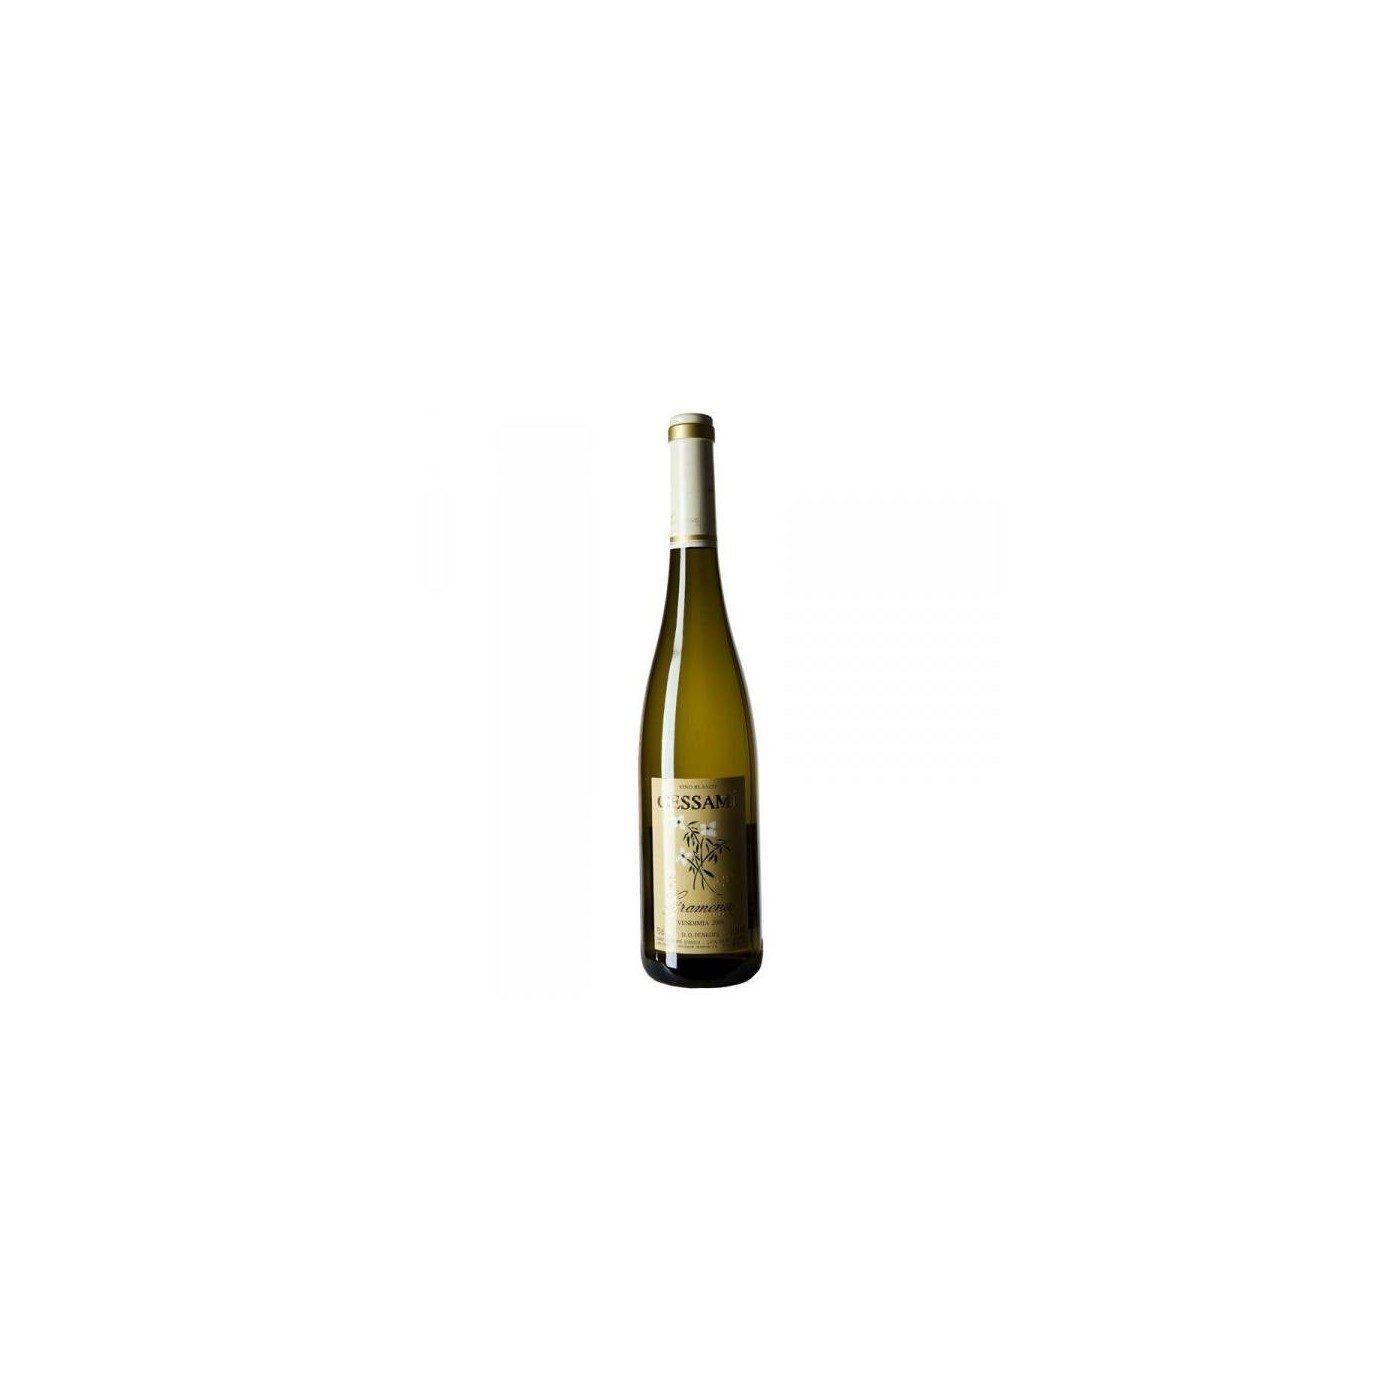 Vino blanco Gessami